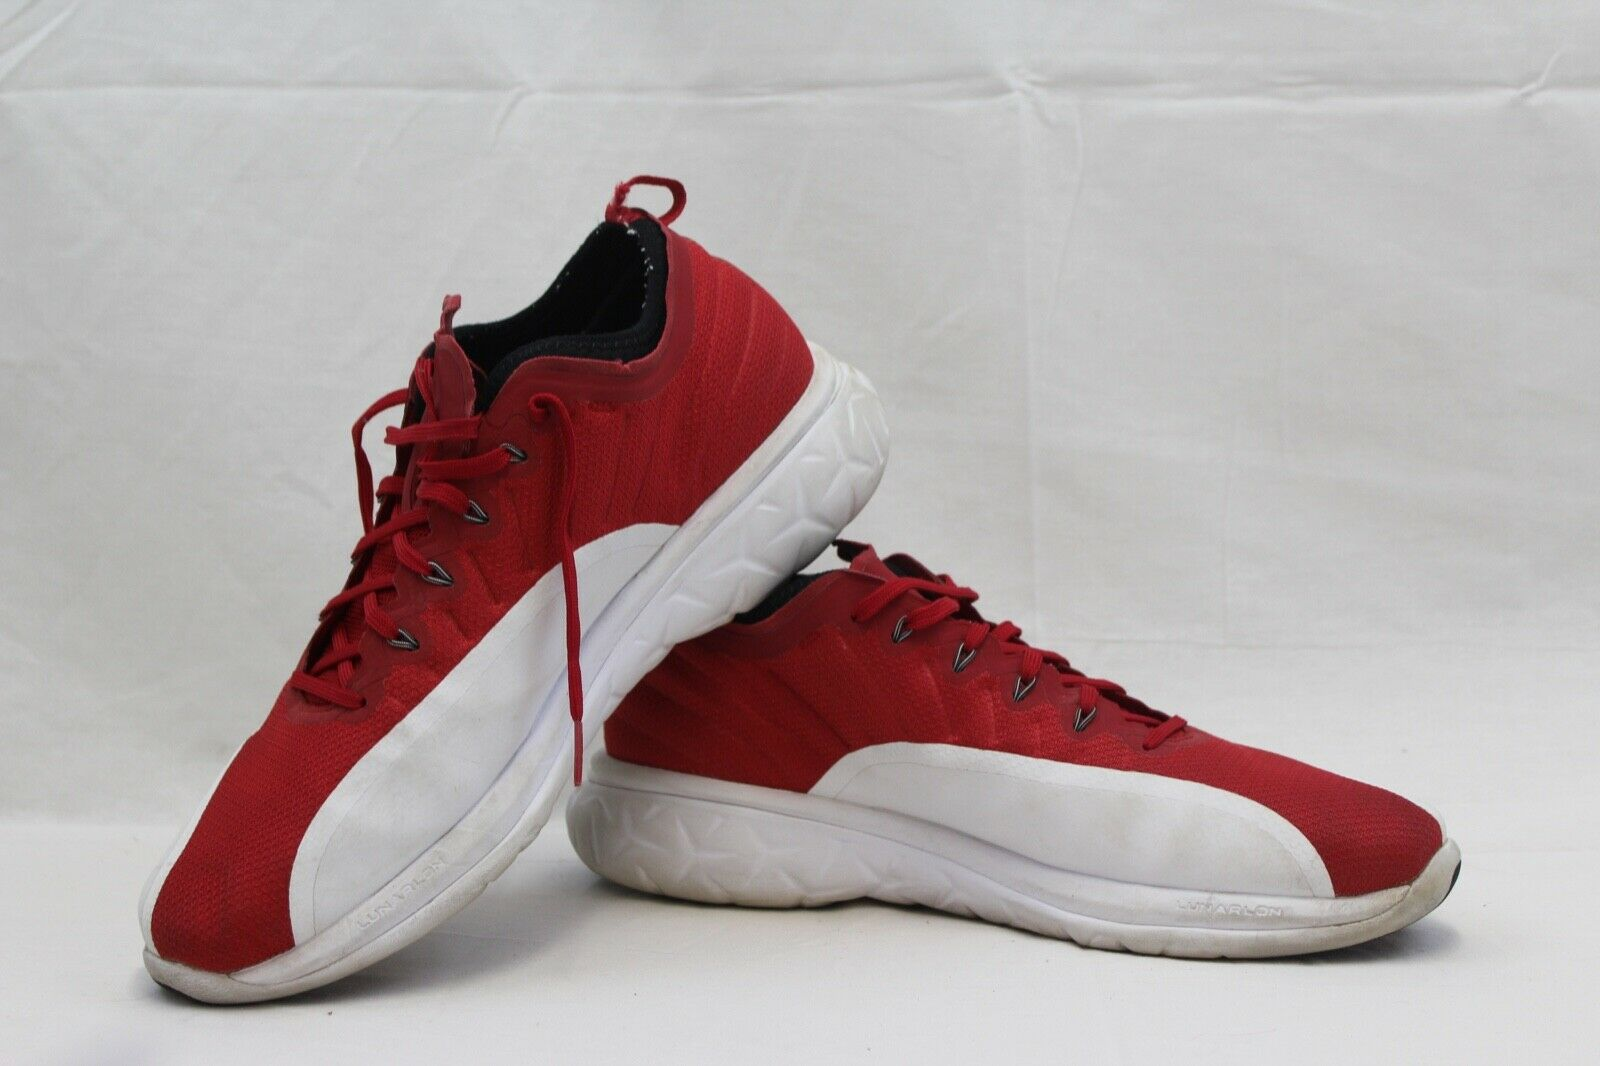 Air Jordan Two 3 Jumpman 23 Red White Men's Size 12 FREE SHIPPING